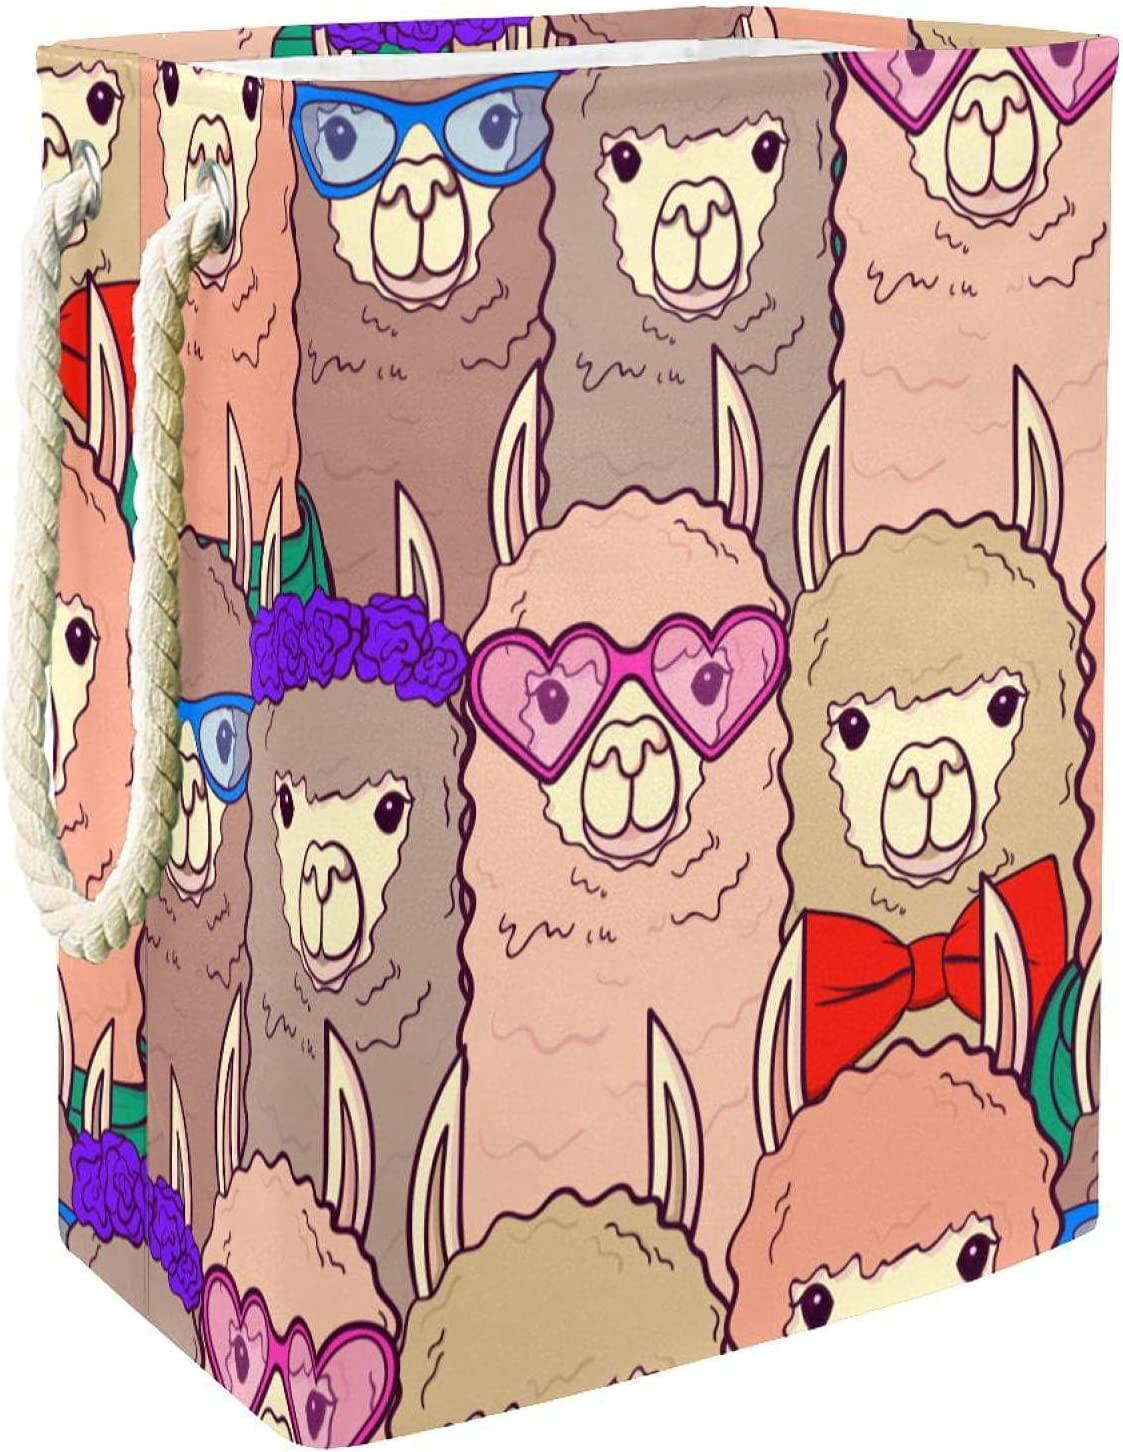 Cartoon Hipster Alpaca Lamas Faces Collapsible Re Basket Bargain sale Ranking TOP2 Laundry